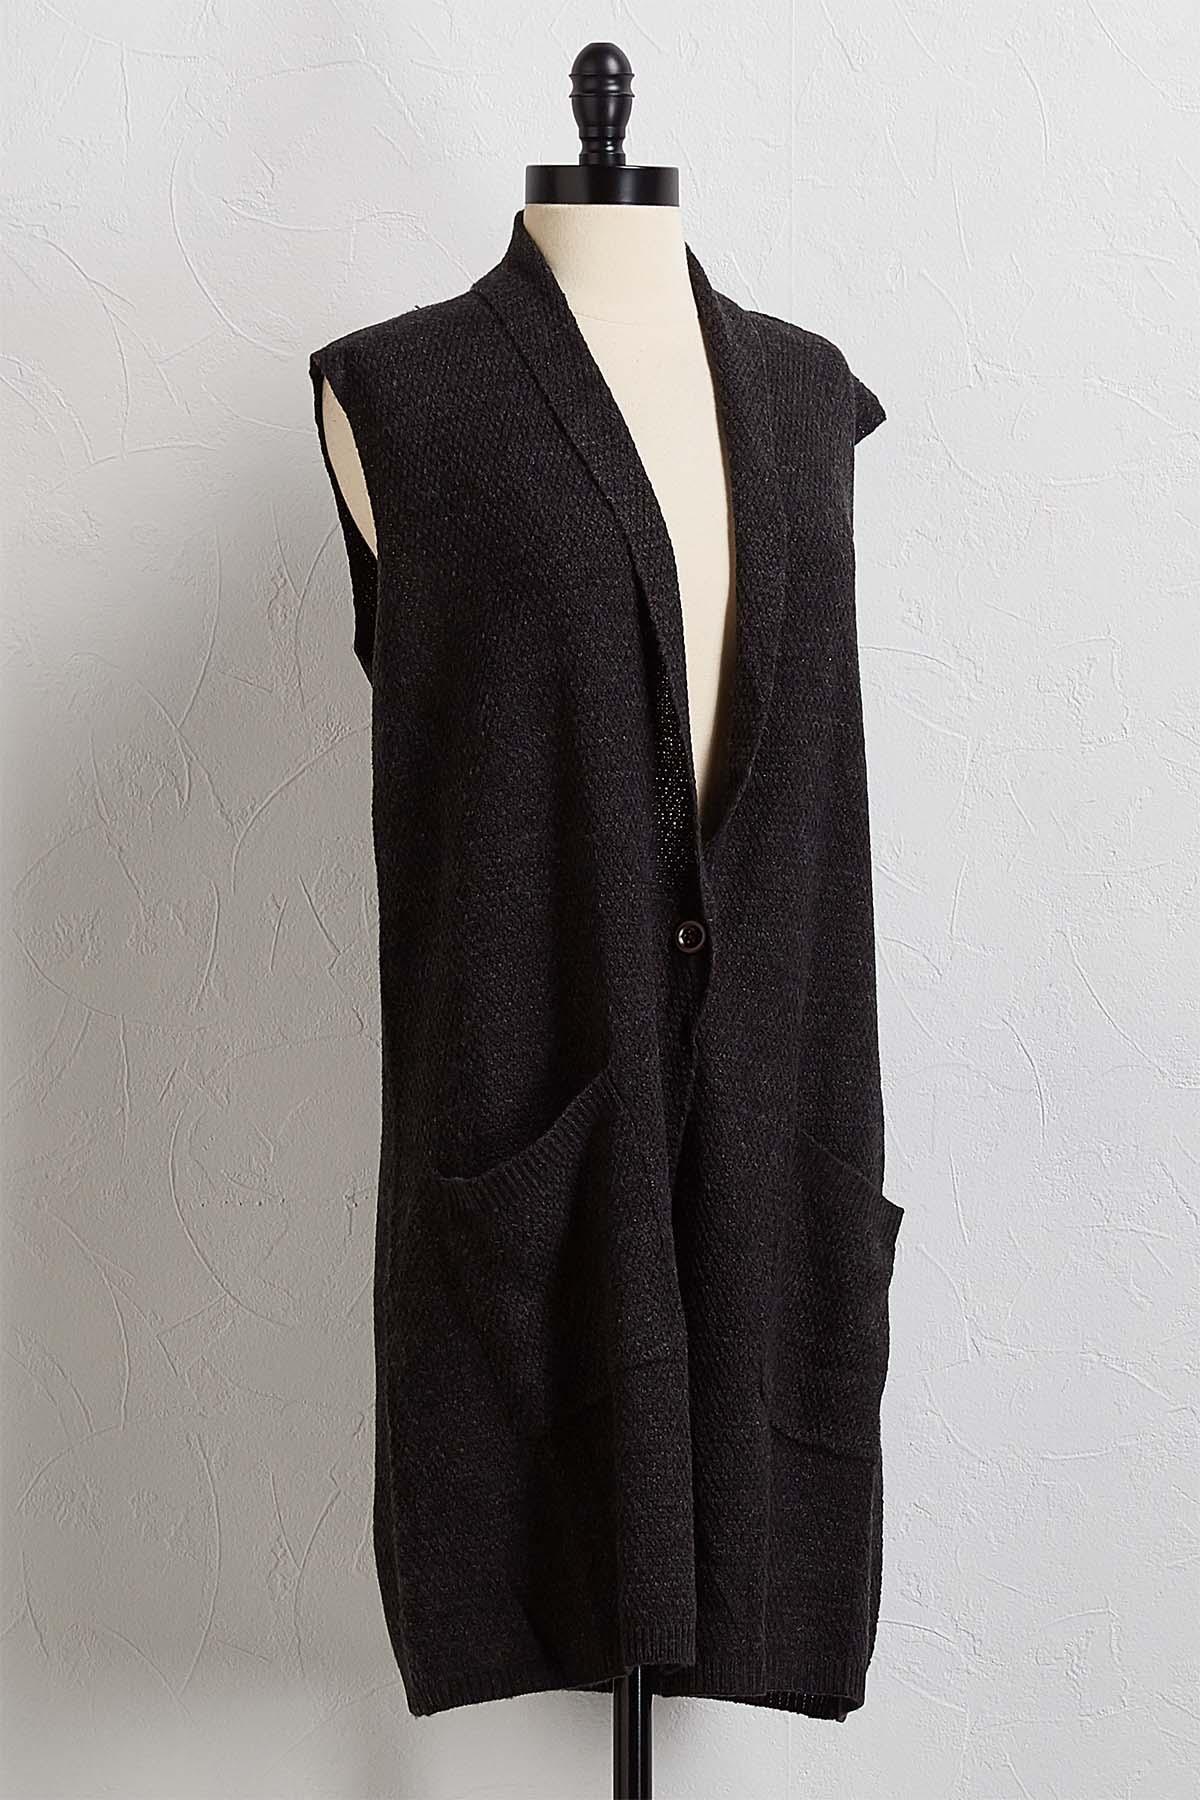 Charcoal Cardigan Sweater